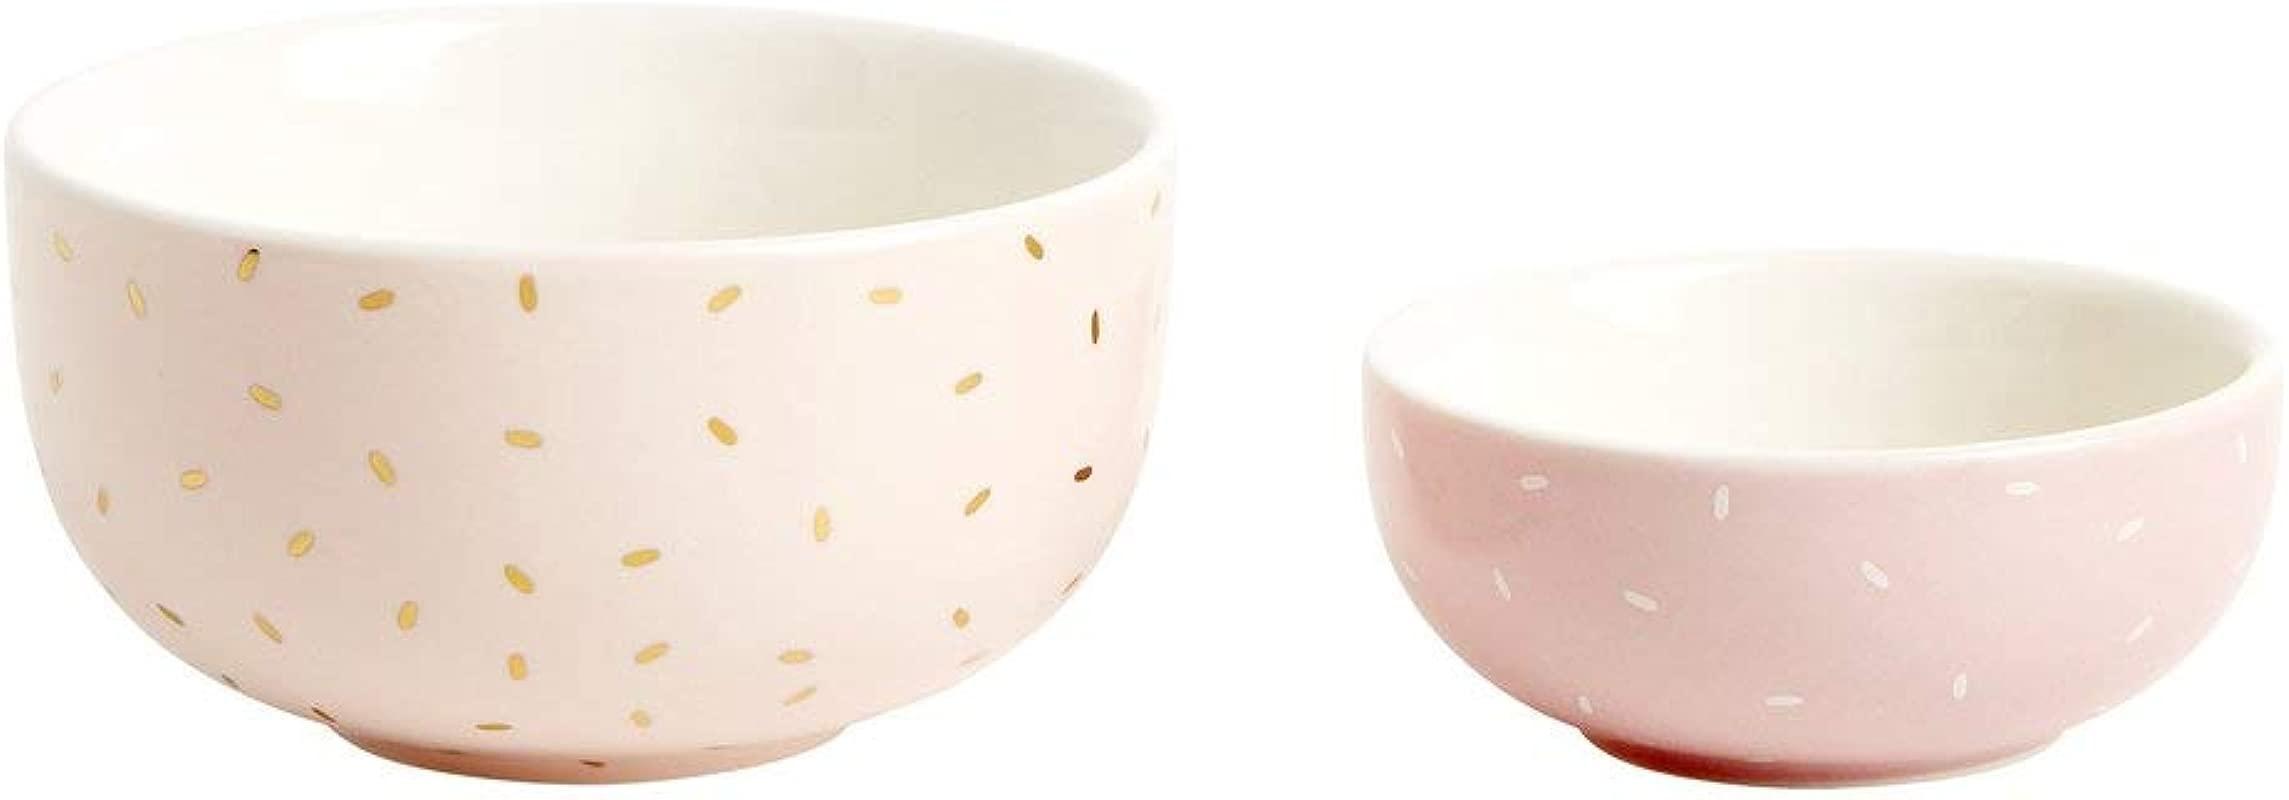 Kikki K Porcelain Dish 2Pk Your Story